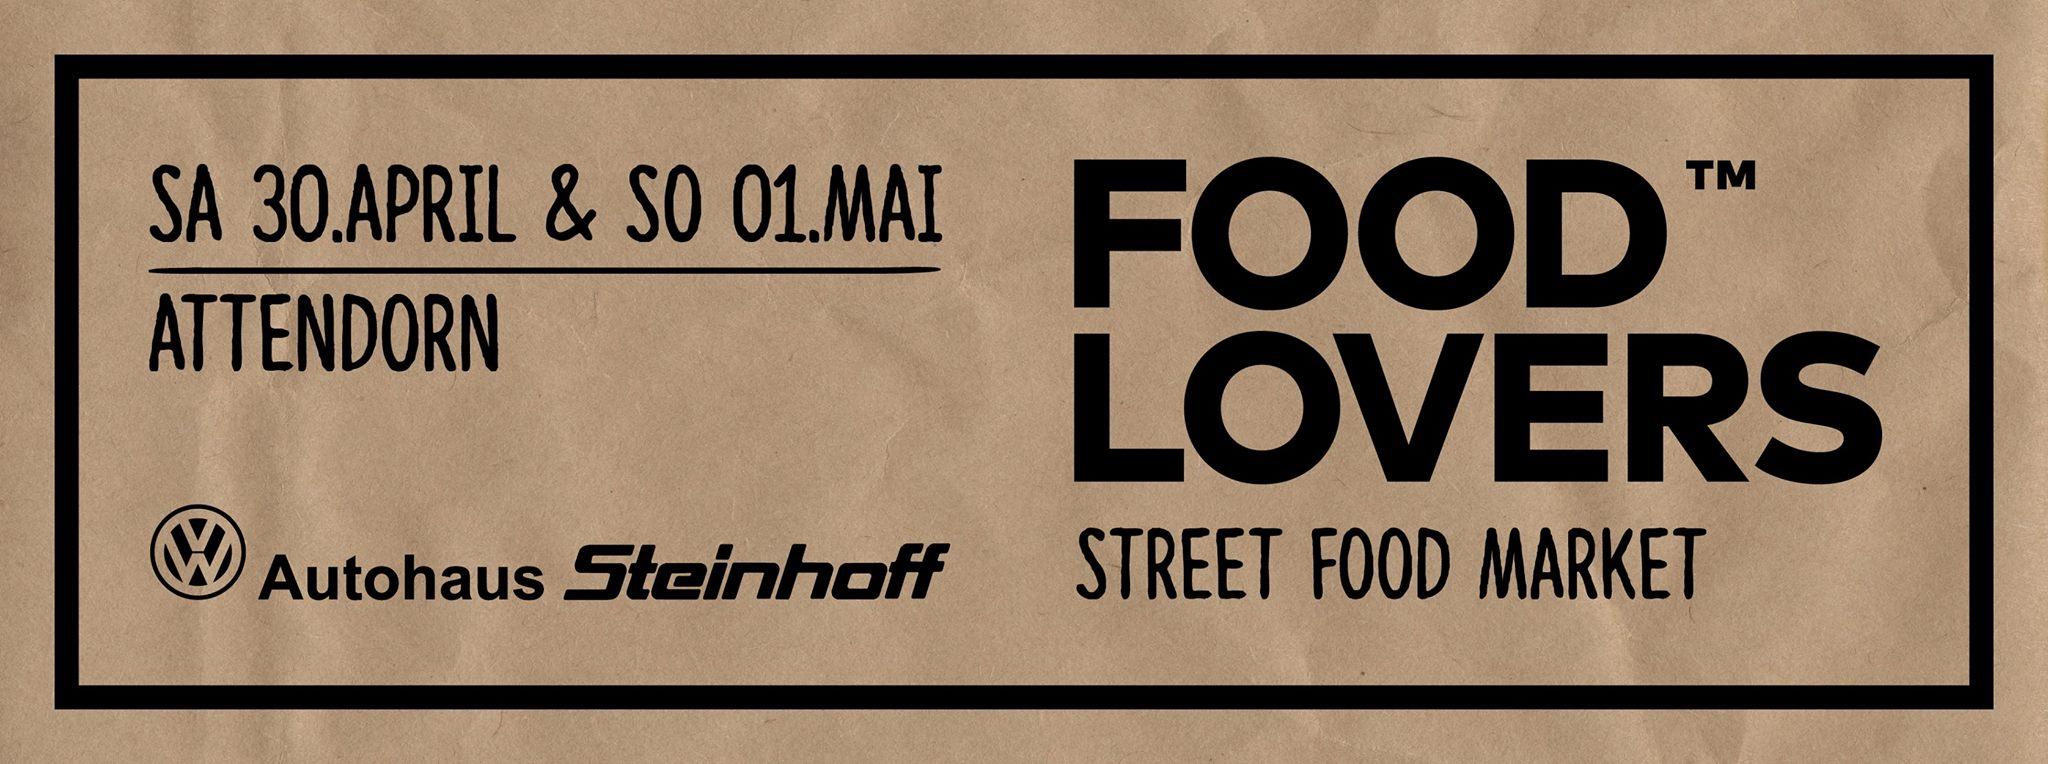 Aktion-Steinhoff-Food-Lovers